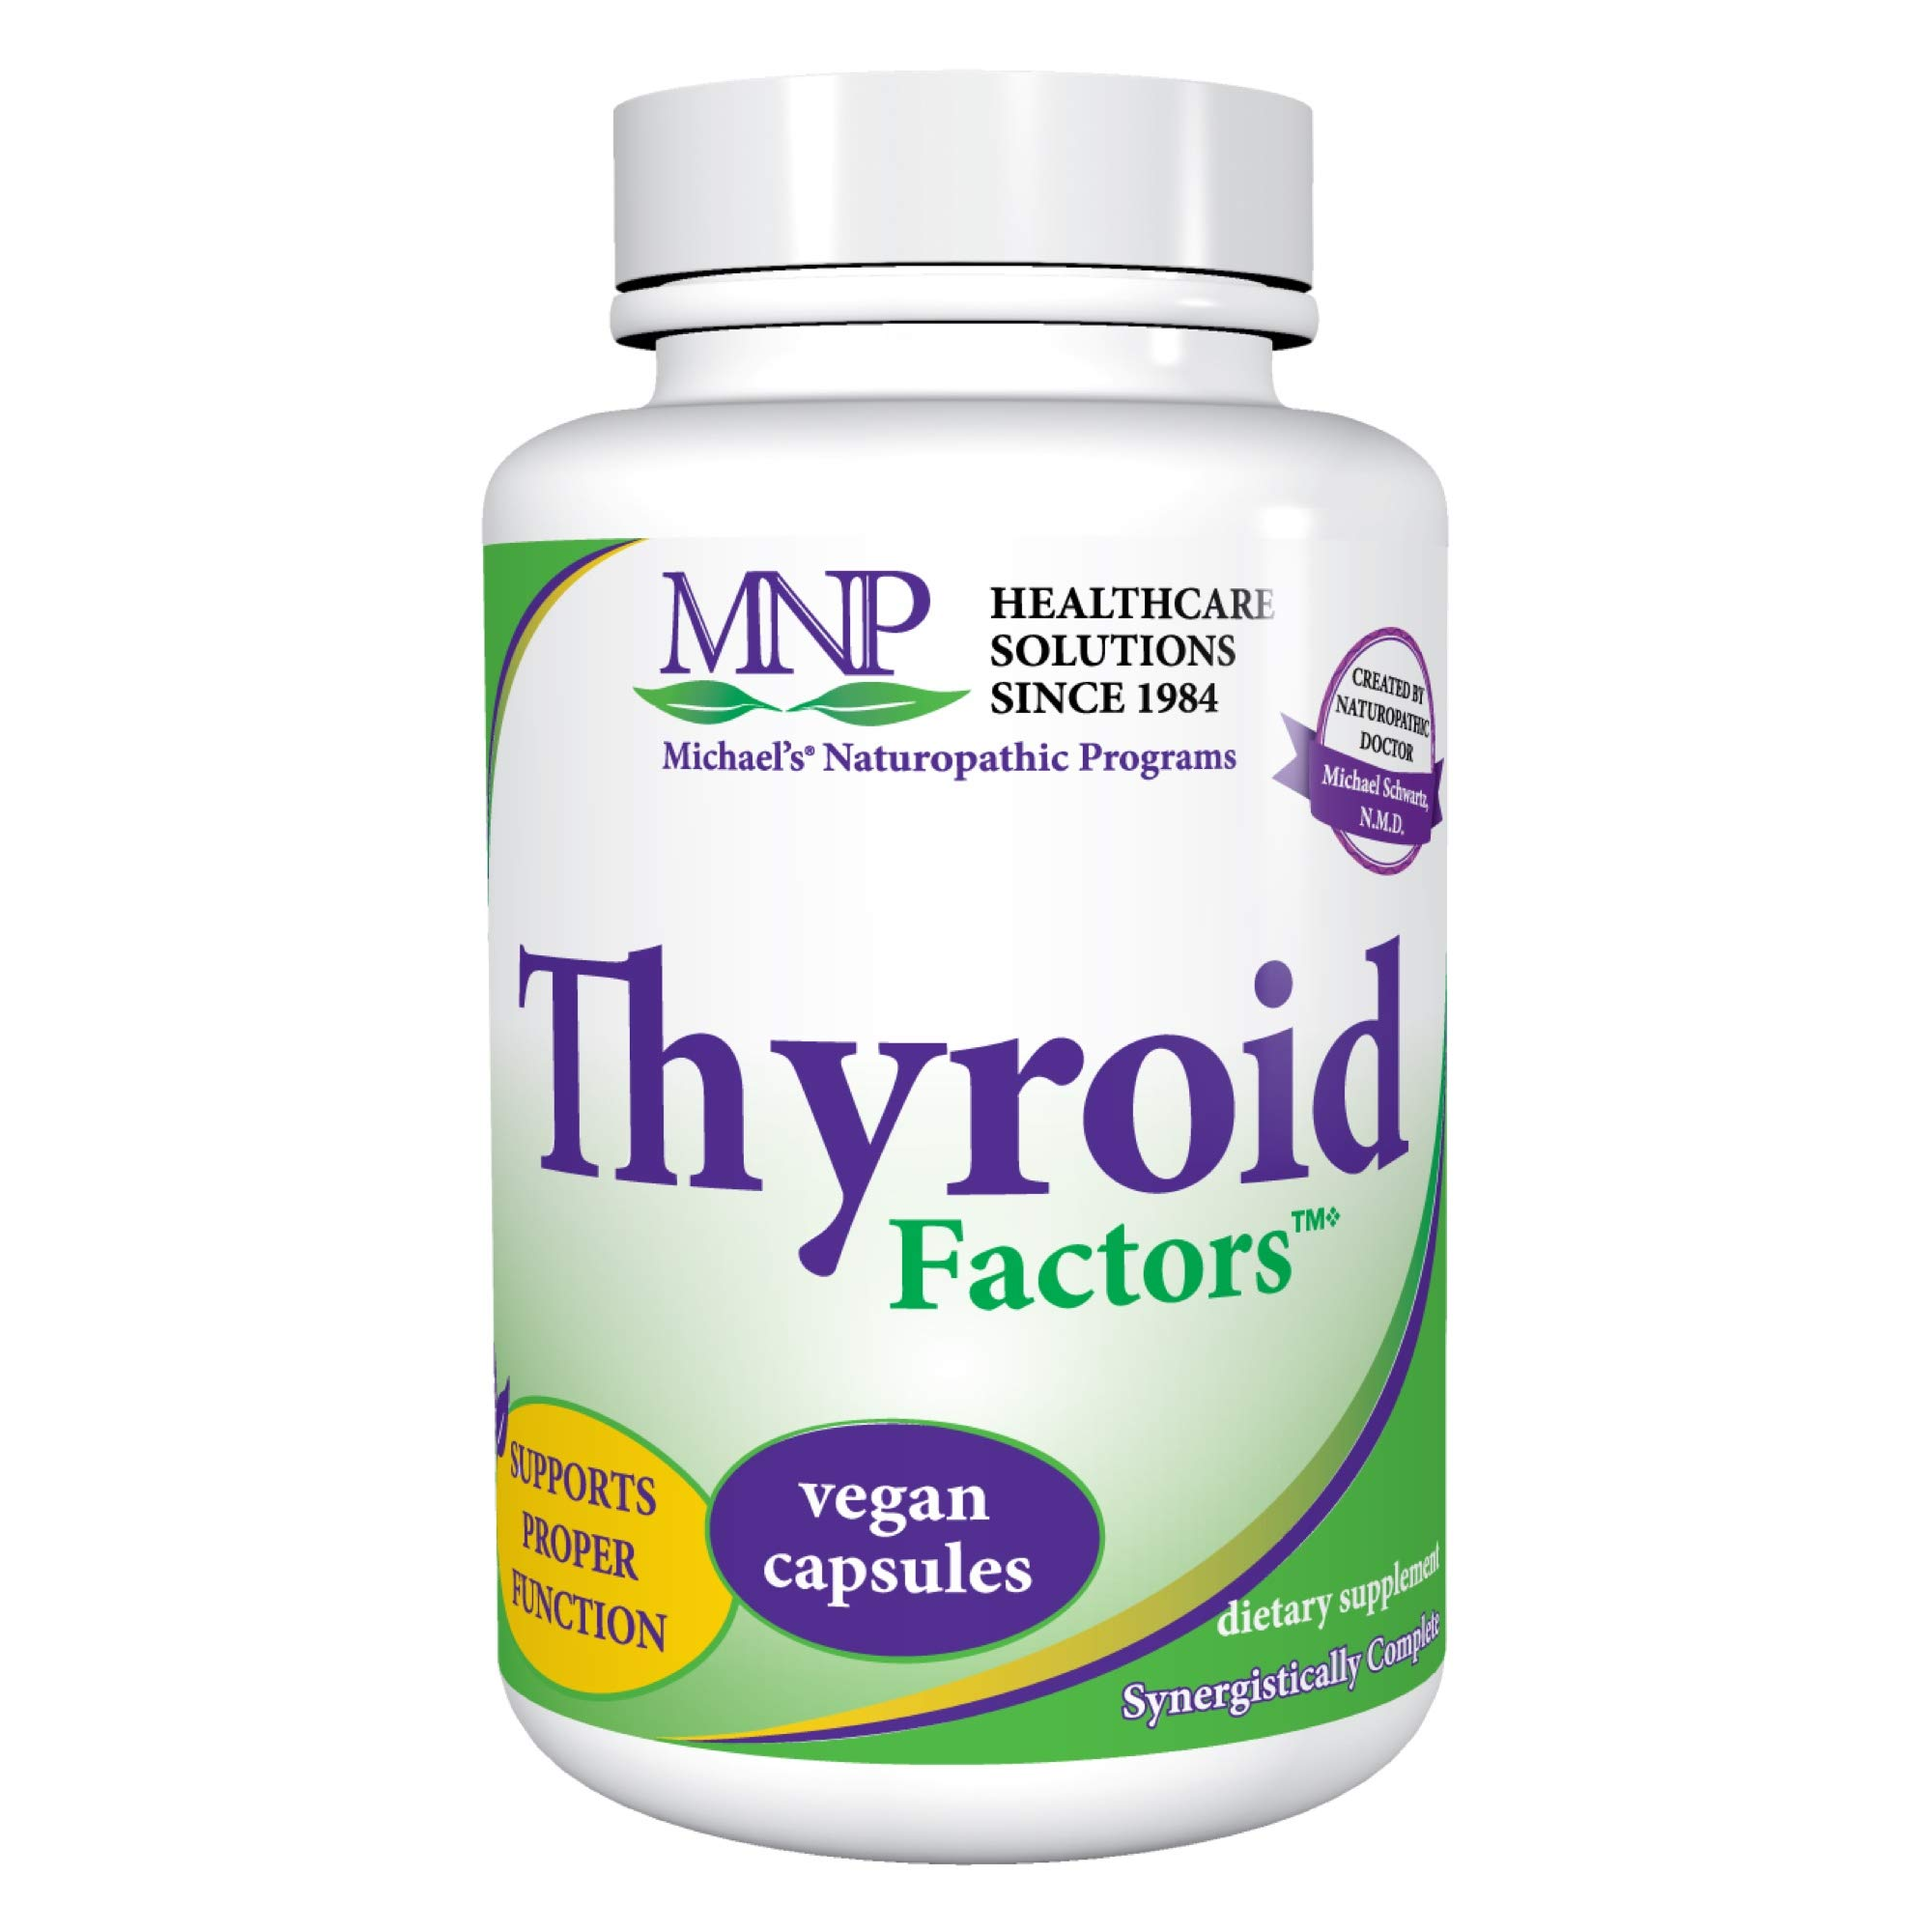 Michael's Naturopathic Programs Thyroid Factors - 120 Vegan Capsules - Thyroid Support Supplement, Promotes Production of Thyroxin & Triiodothyronine - Vegetarian, Kosher - 40 Servings